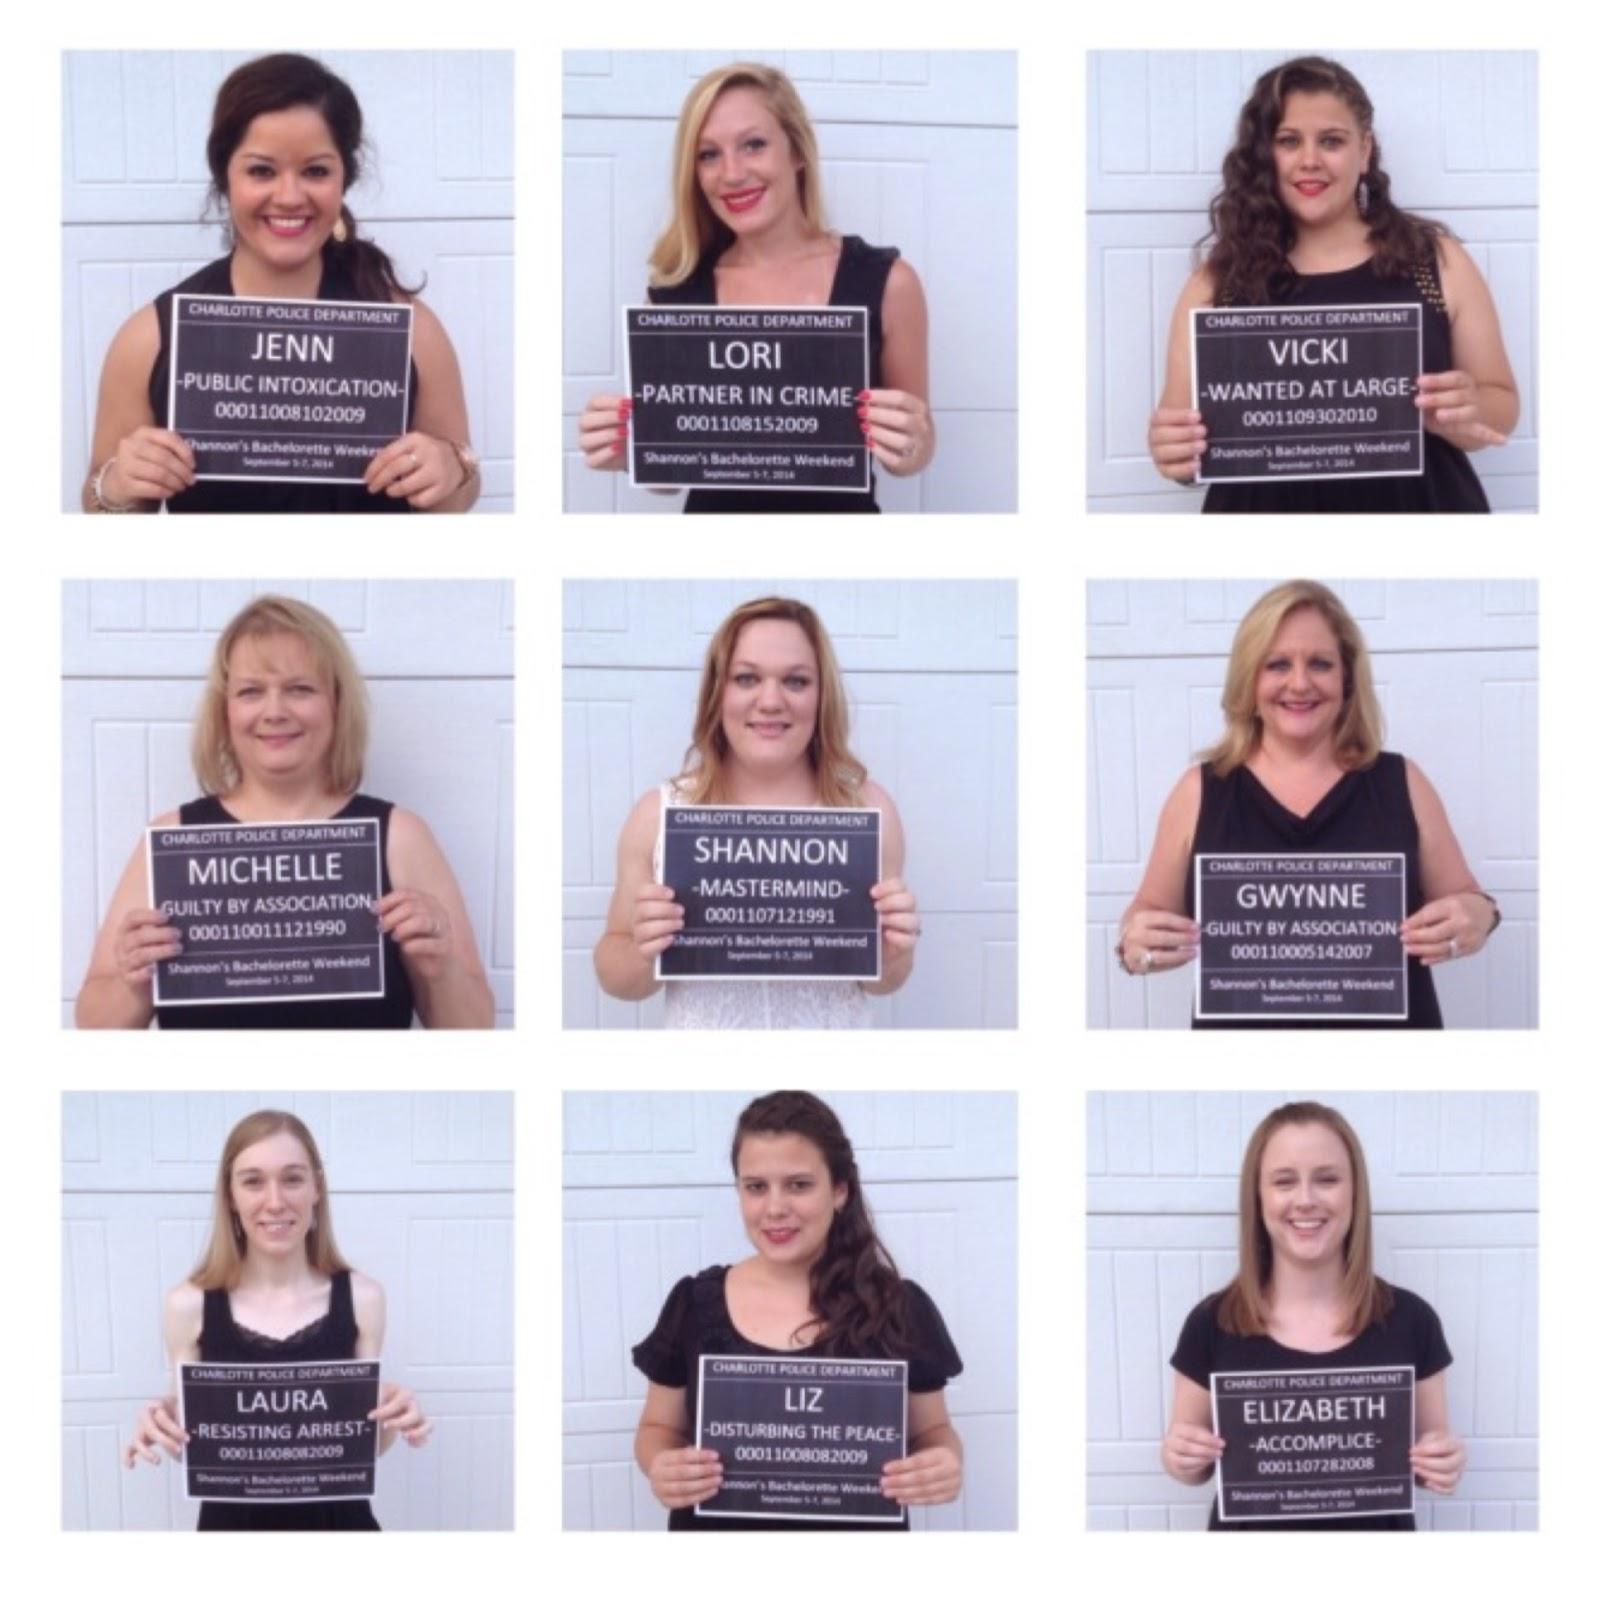 3 t girls go rough punishing tied perv 5